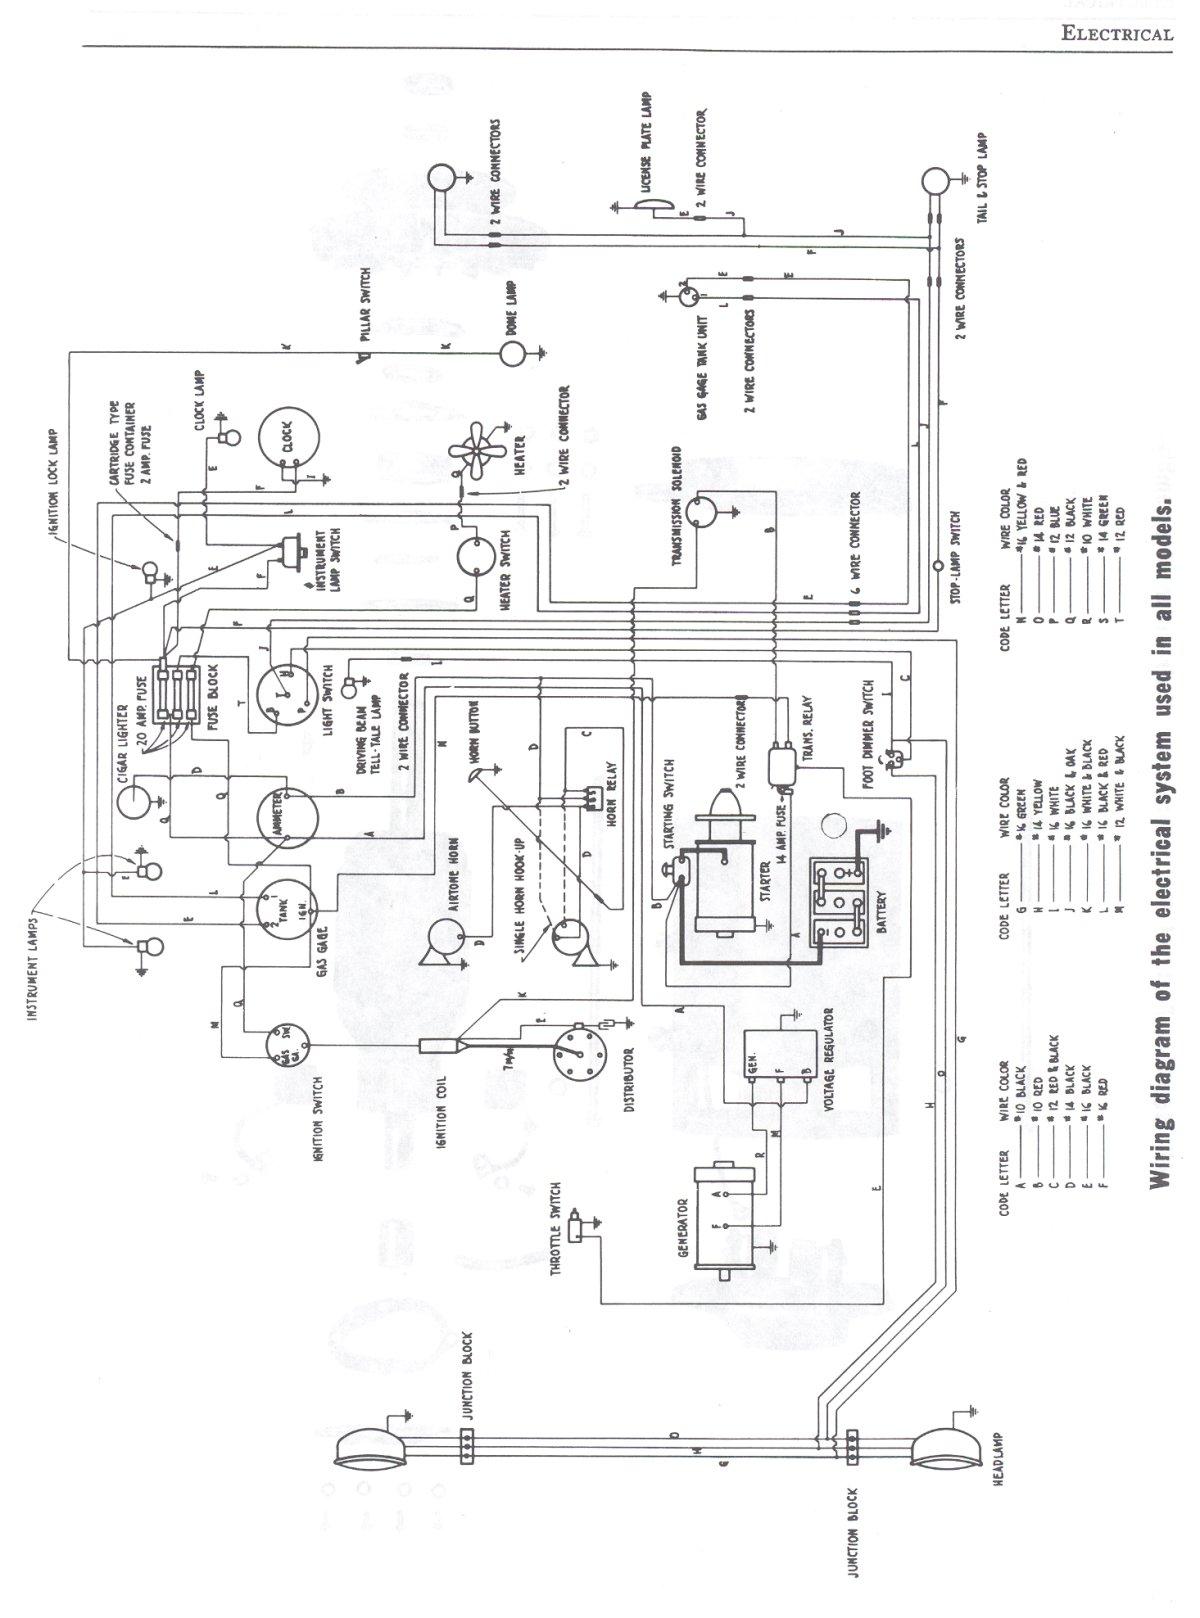 1954 studebaker wiring diagrams